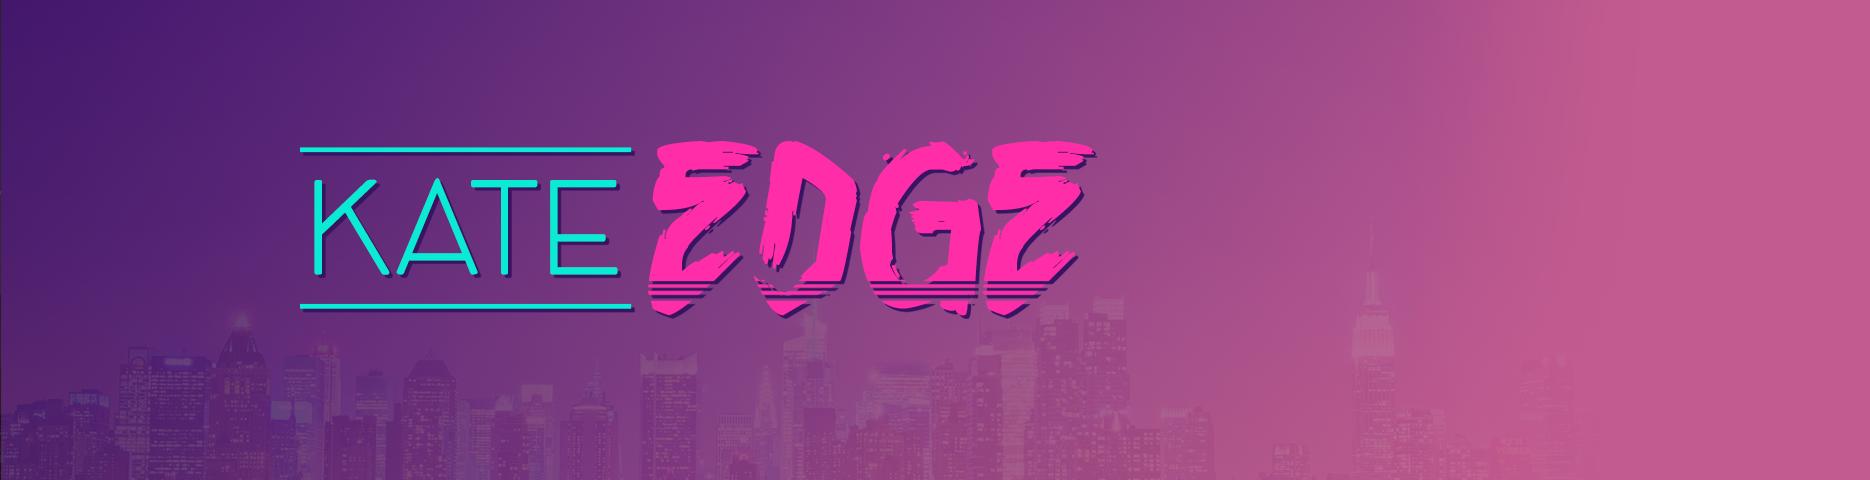 KateEdge